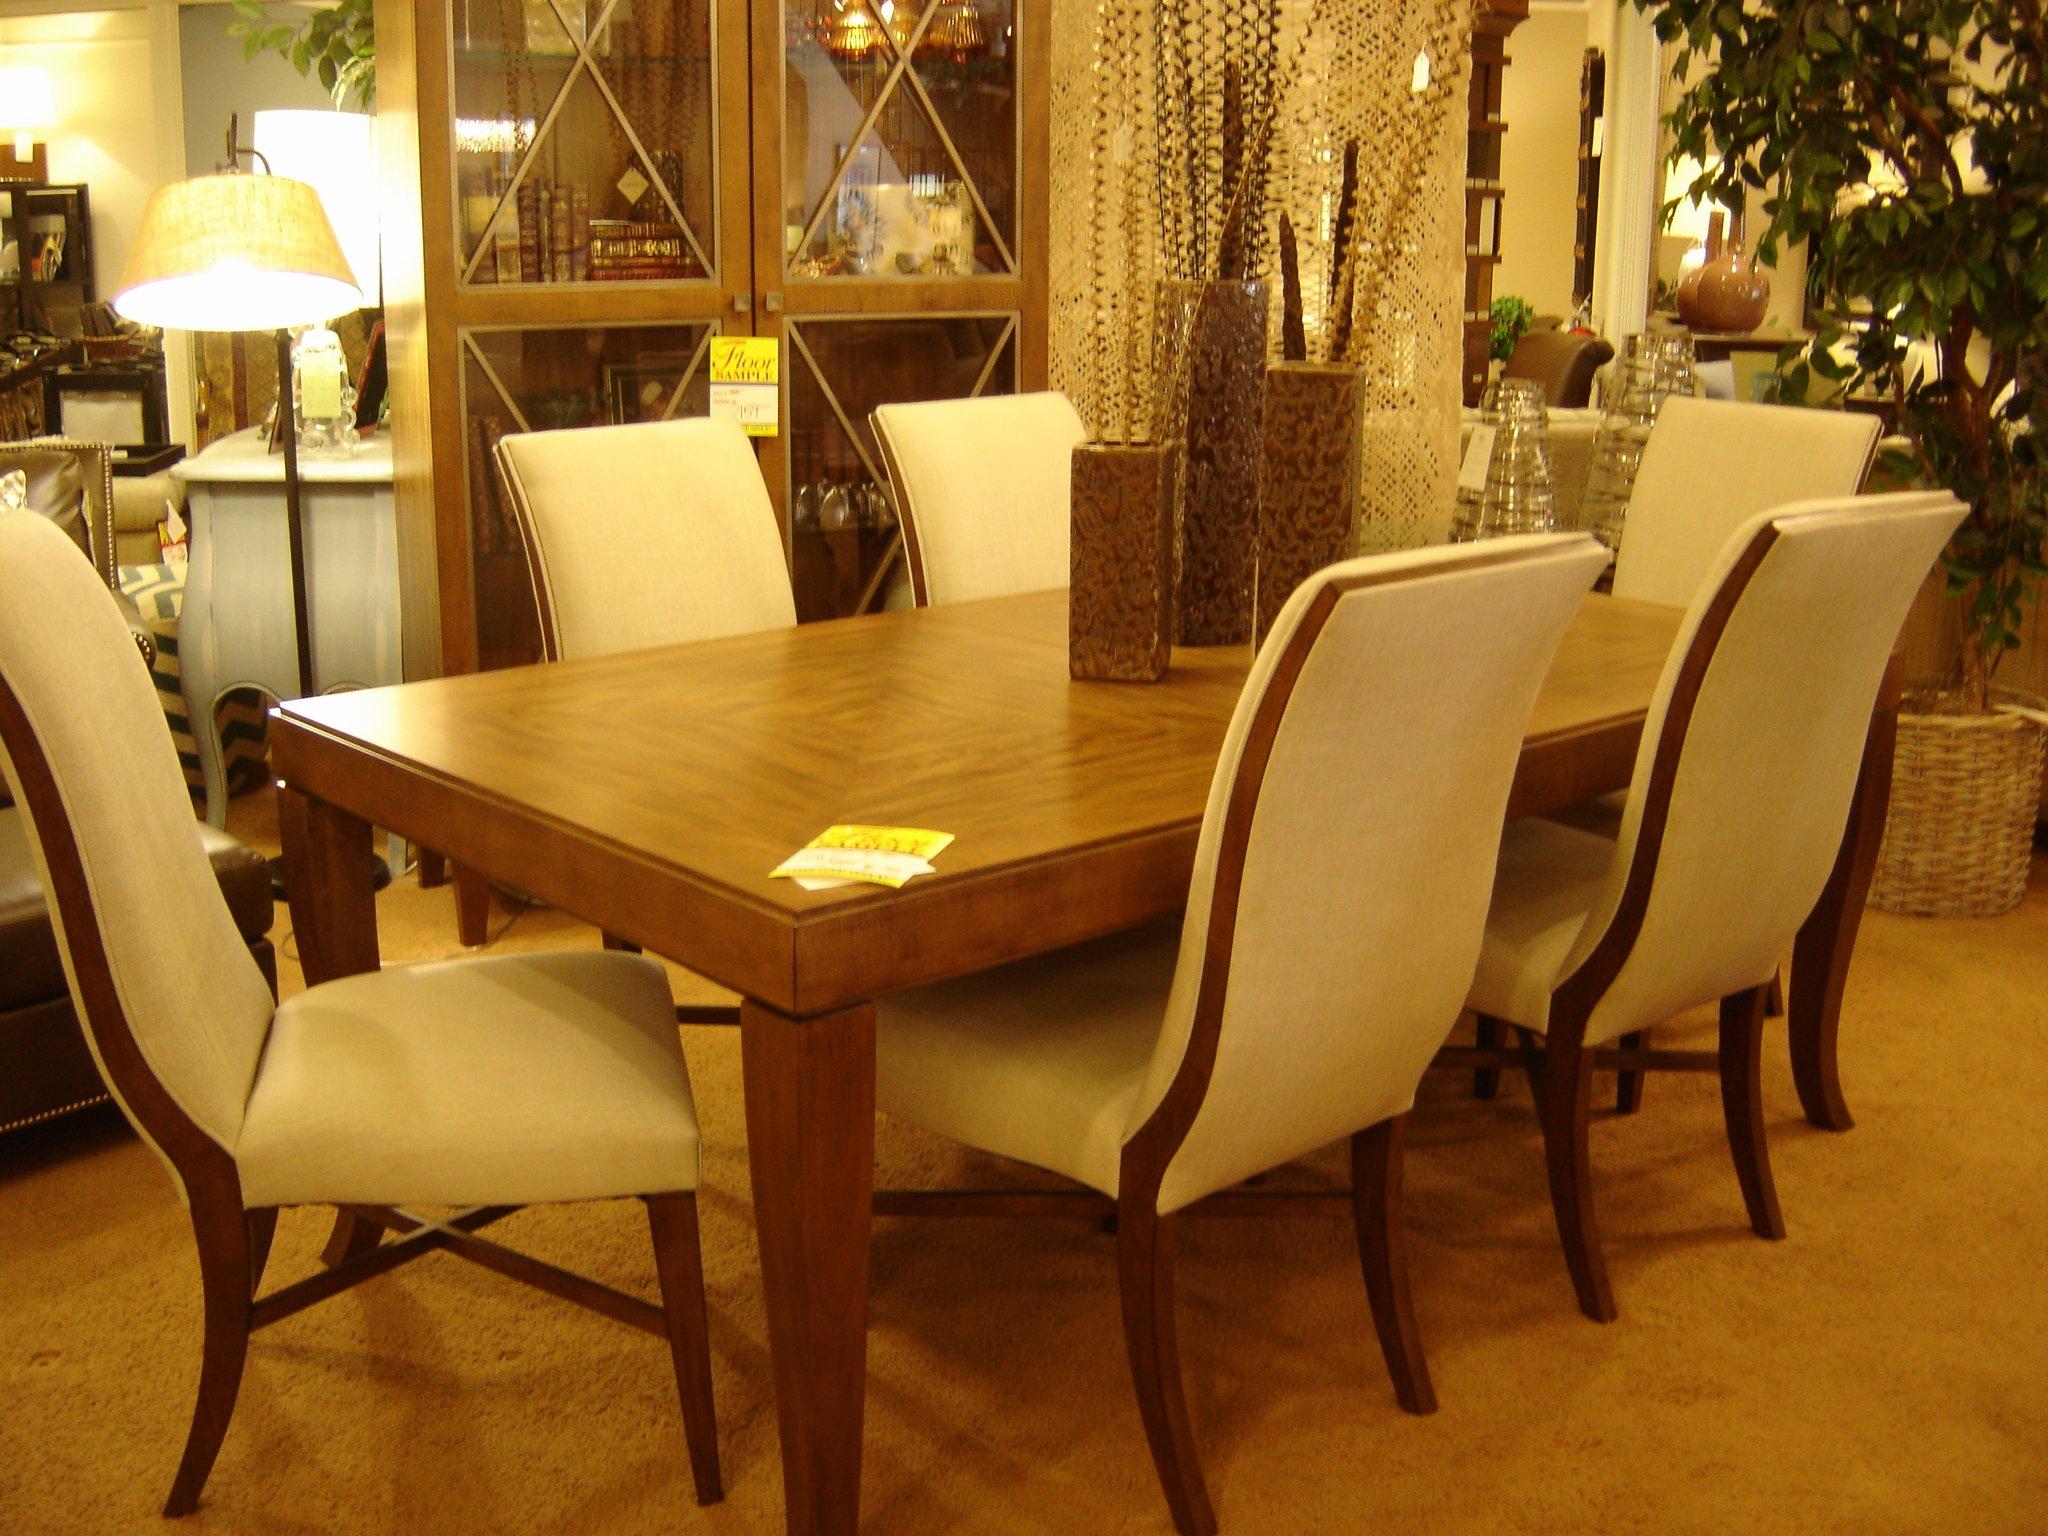 7 Piece Retropolitan Dining Set